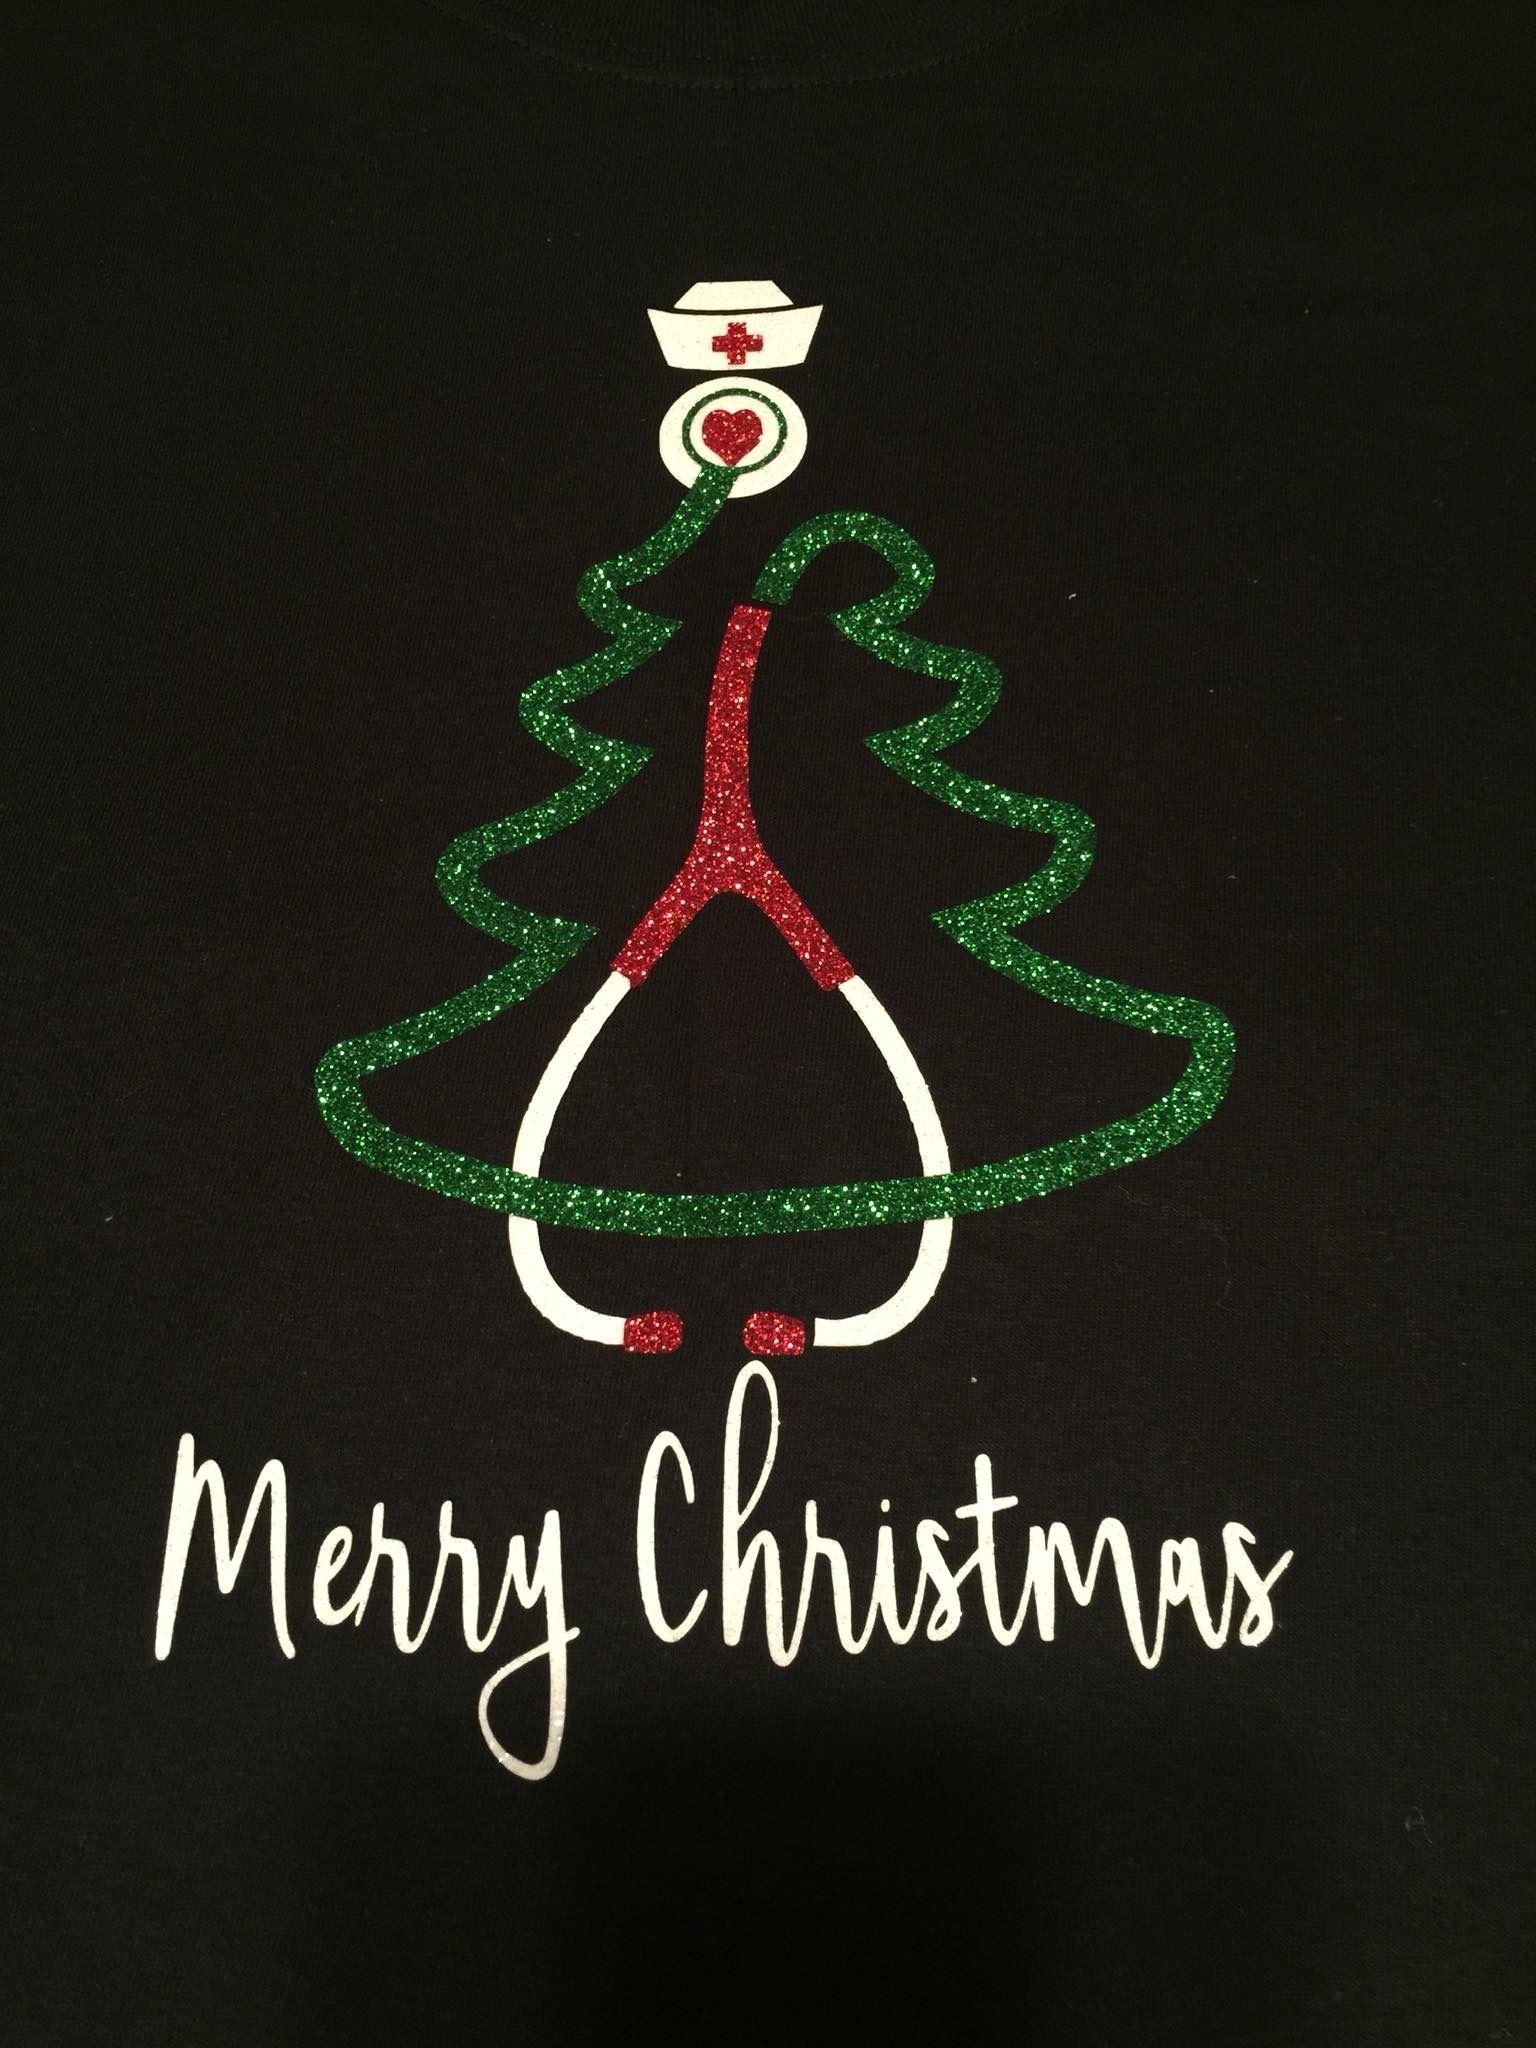 Nurse Christmas Svg.Nurses Hristmas Christmas Gifts For Nurses Diy Christmas